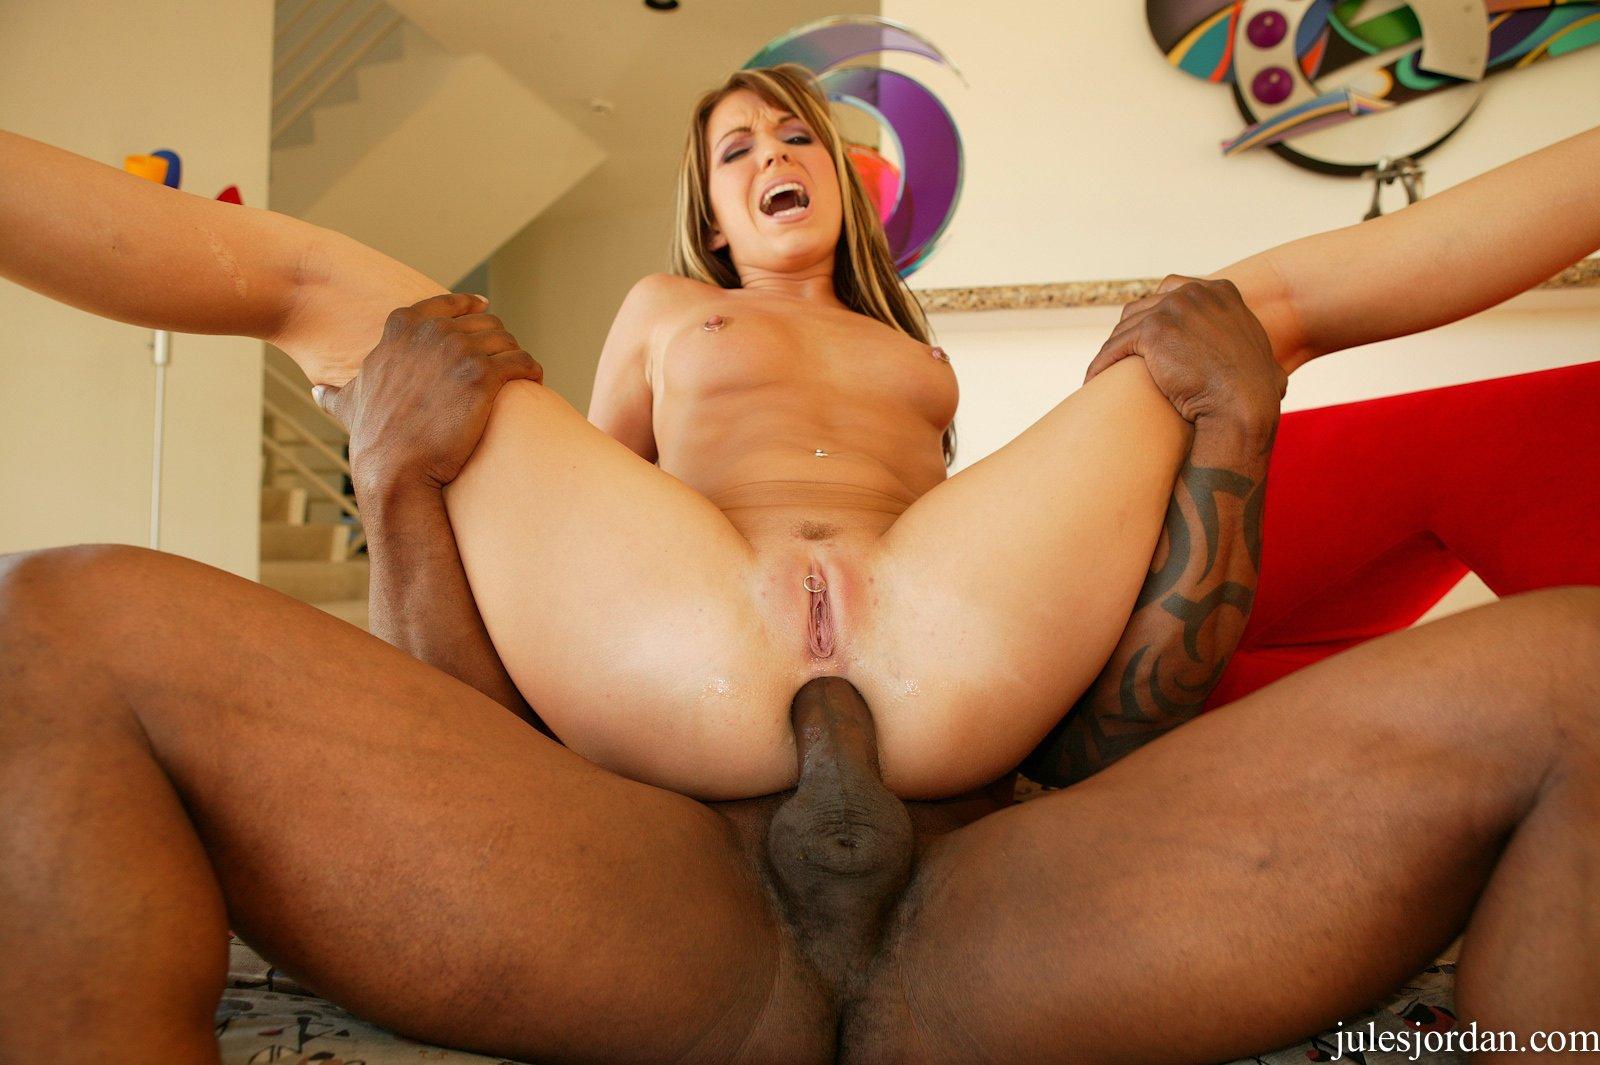 wife giving husband a blowjob